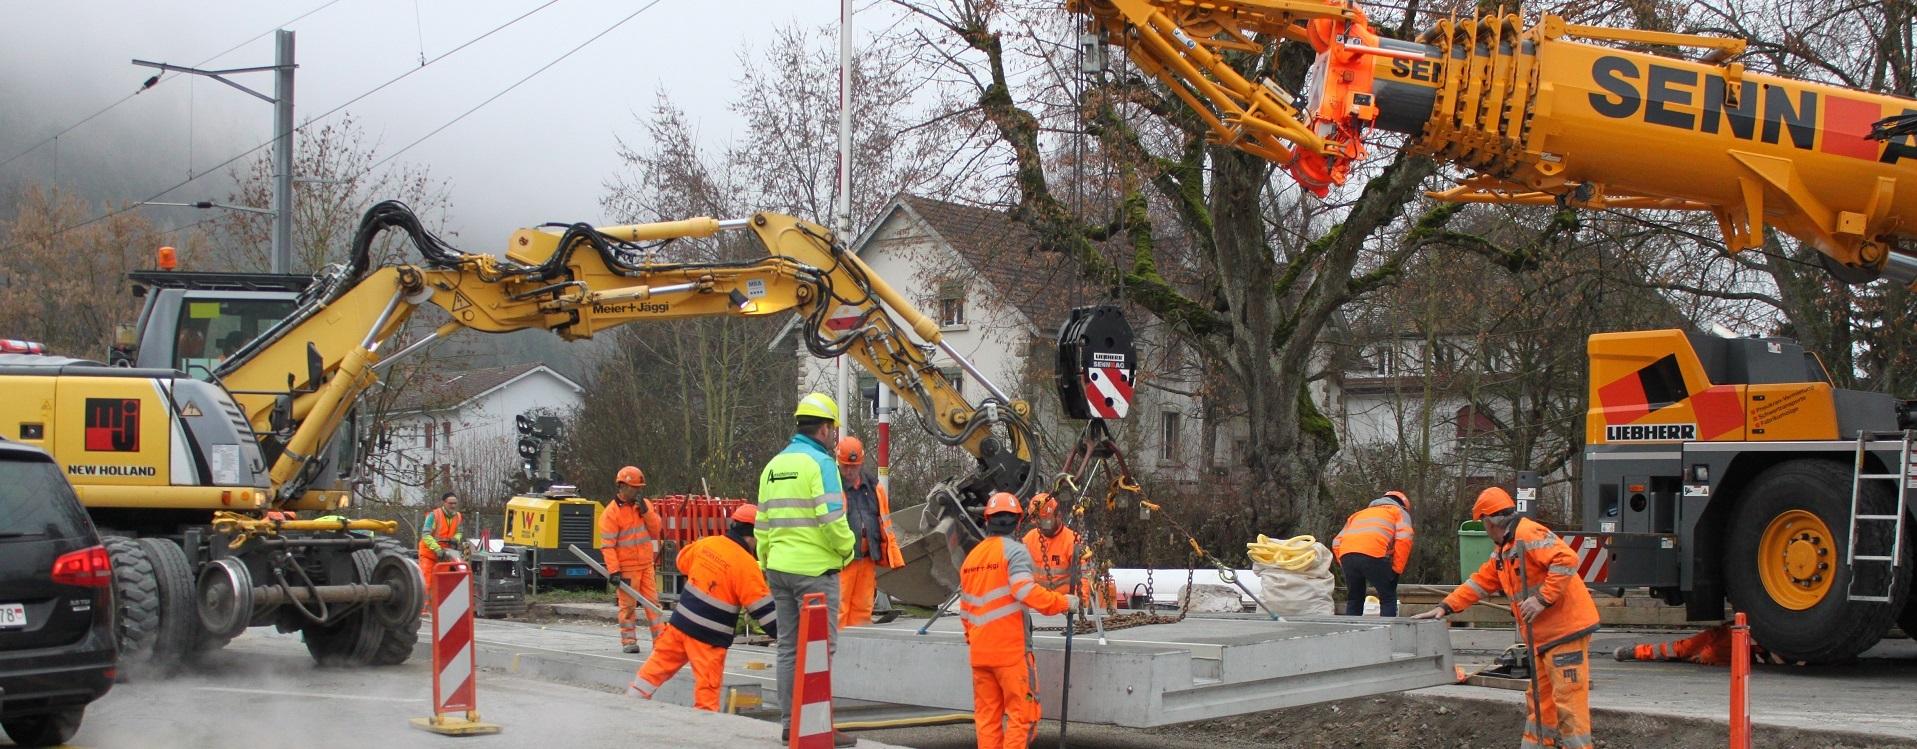 Impressionen Bau-Wochenende vom 21./22. & 28./29. November - Oensingen-Balsthal-Bahn AG